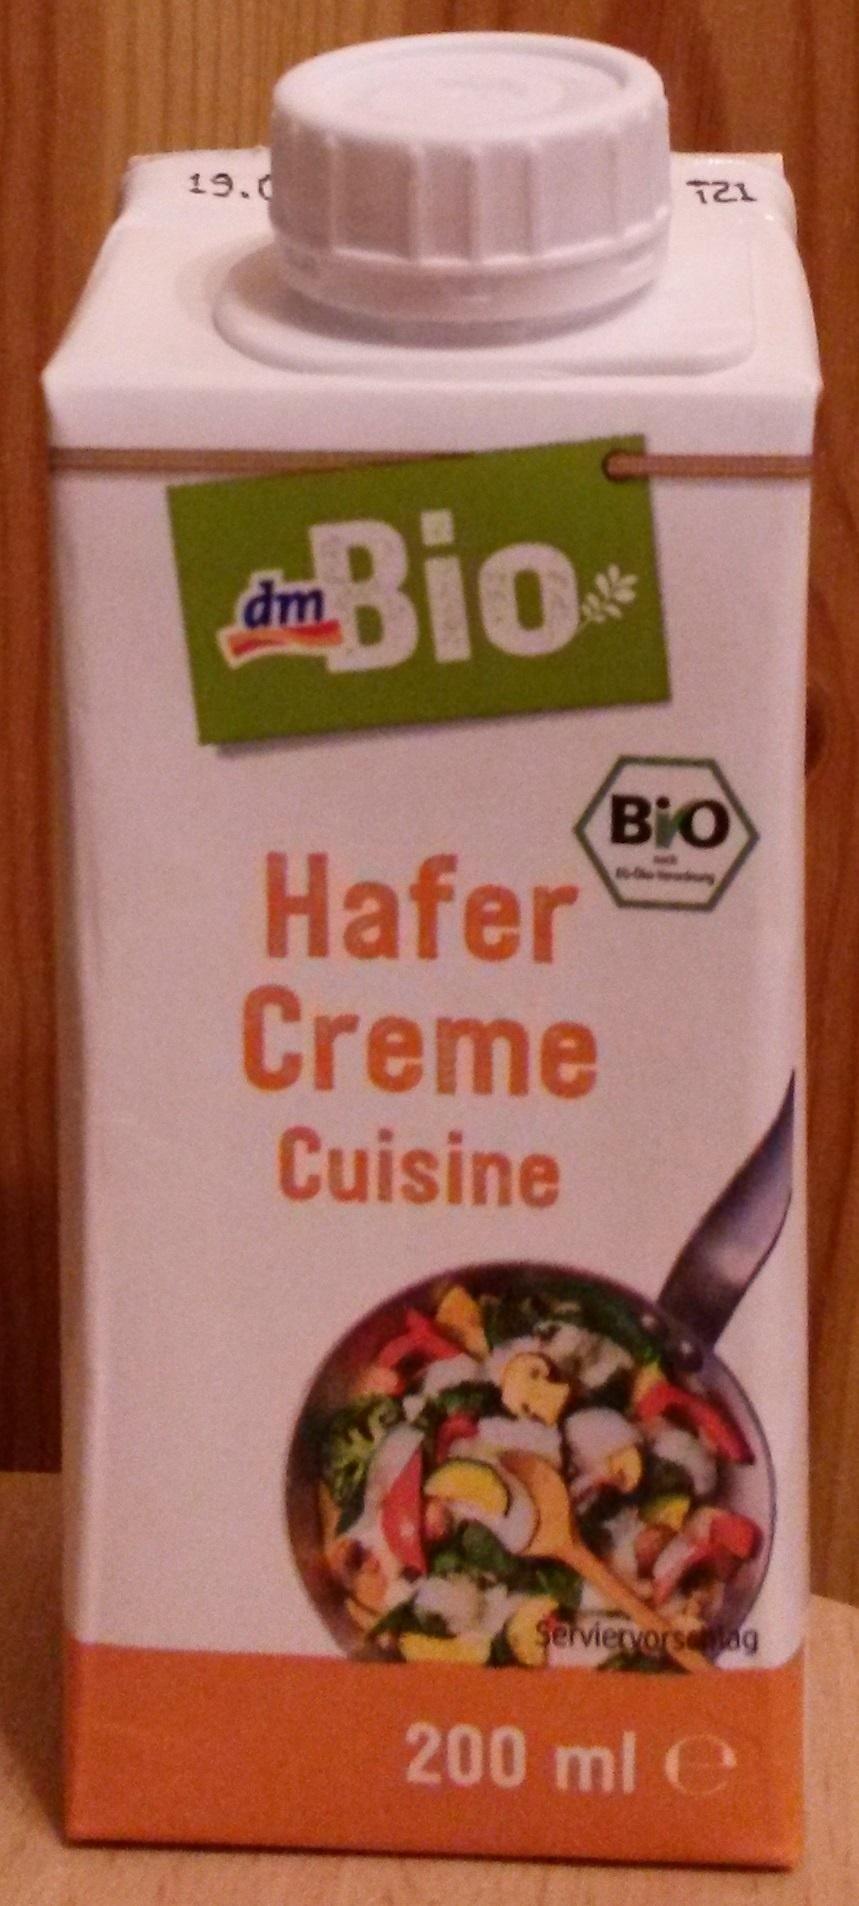 Hafer Creme Cuisine - Product - de